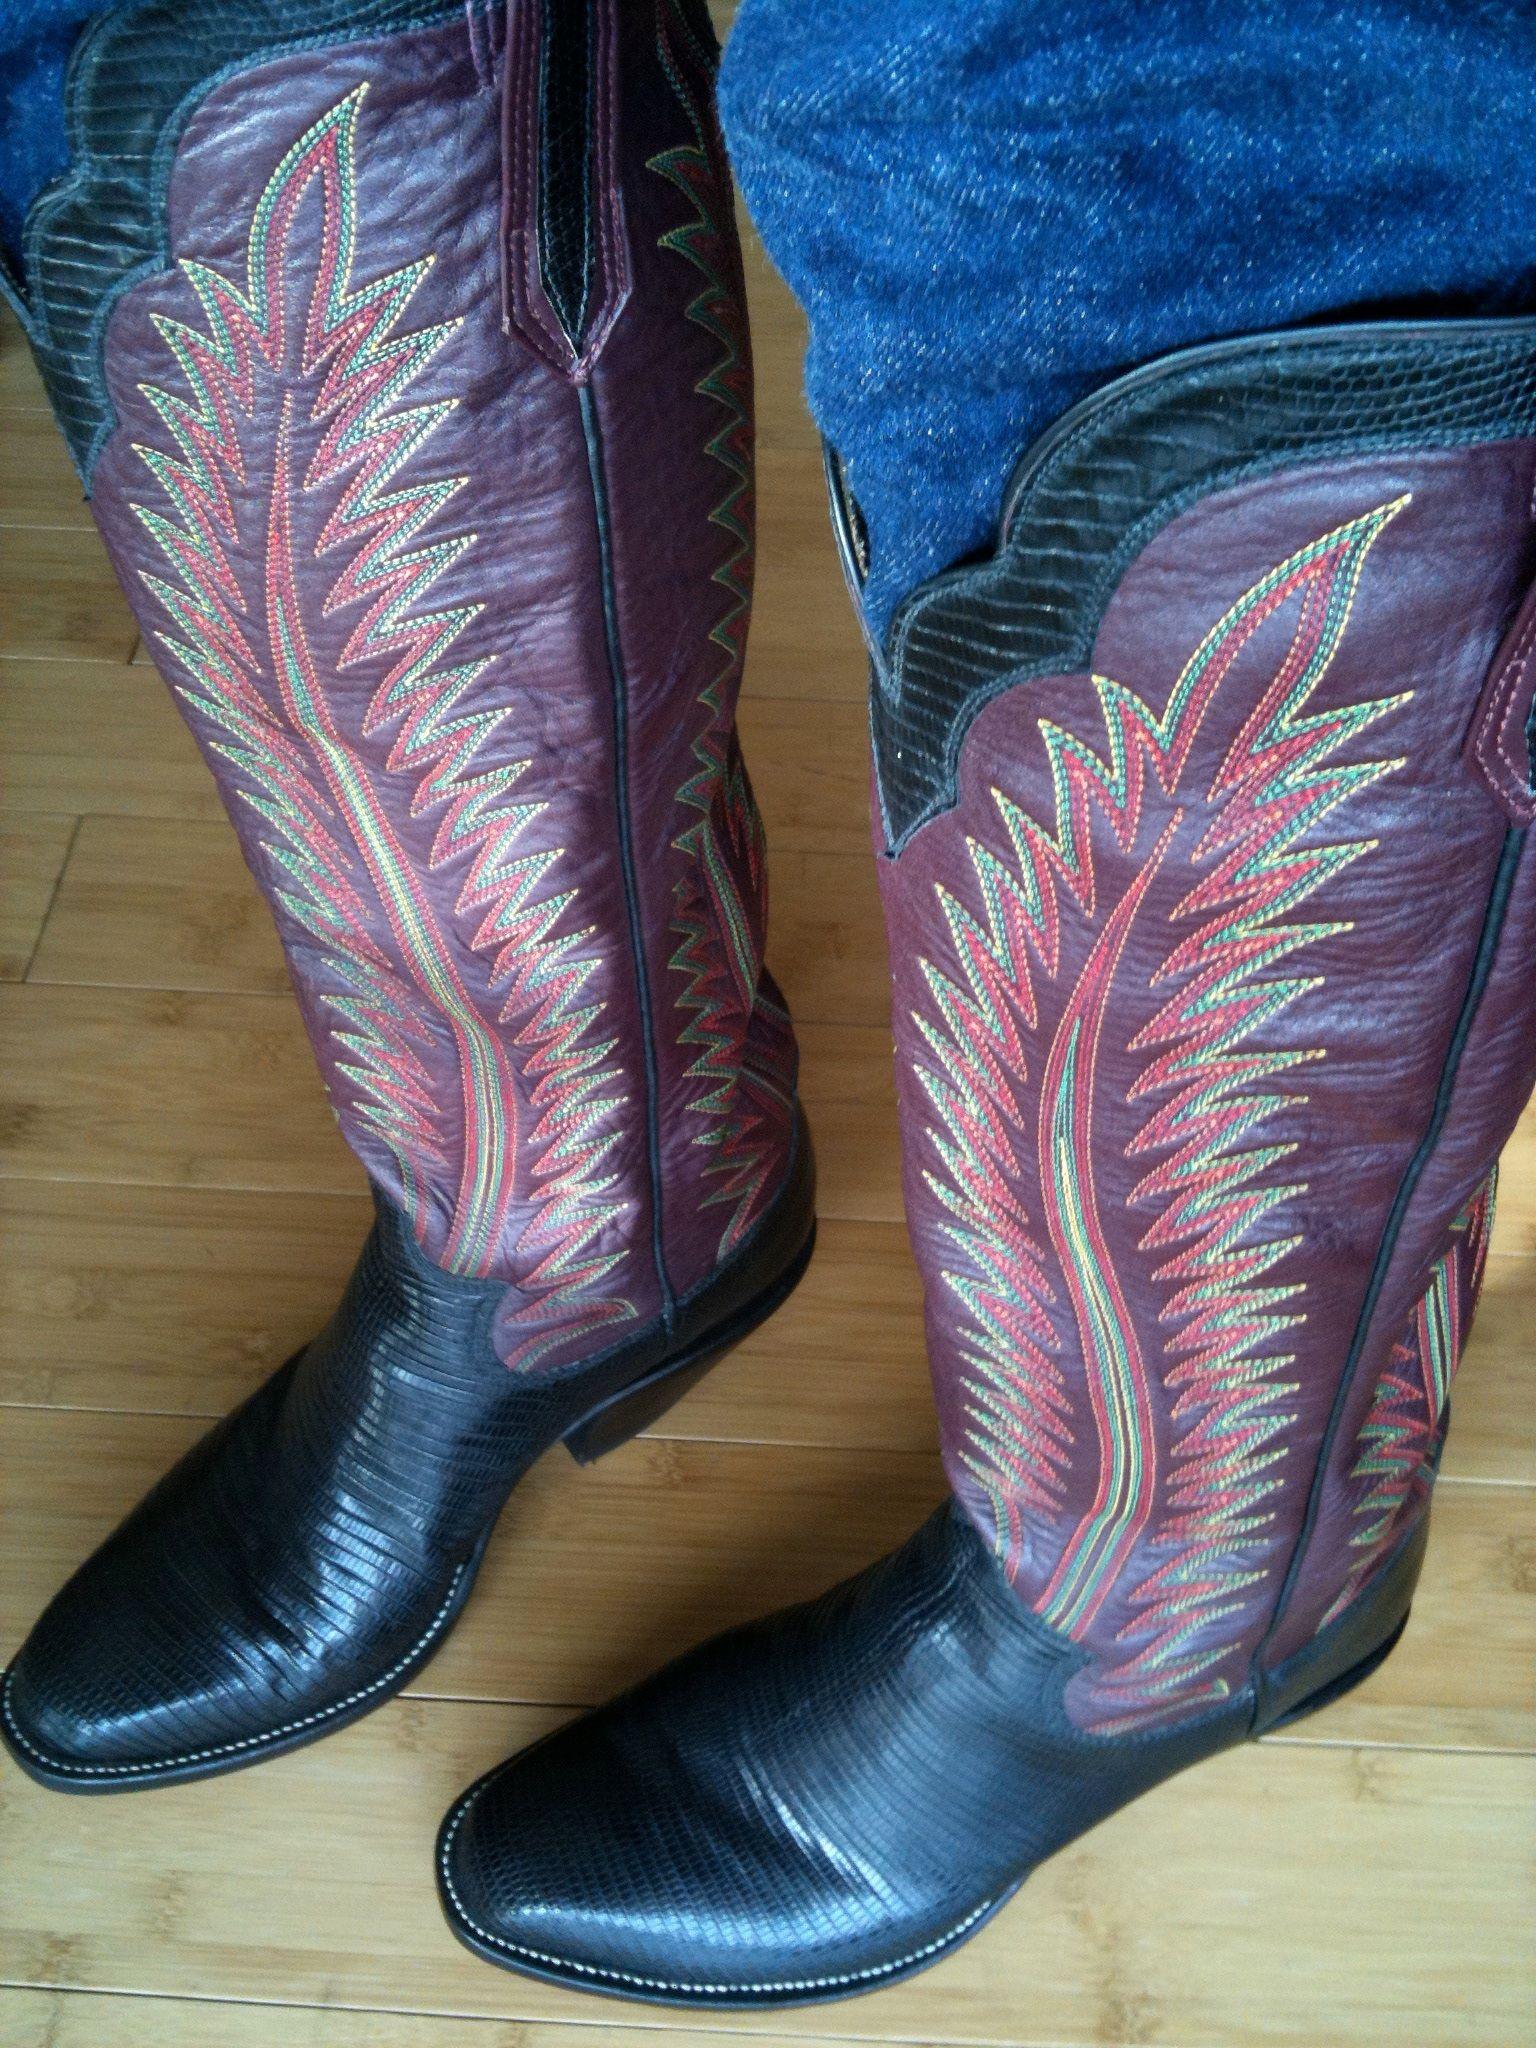 paul bond boots - Google Search   Cowboys & Boots   Pinterest